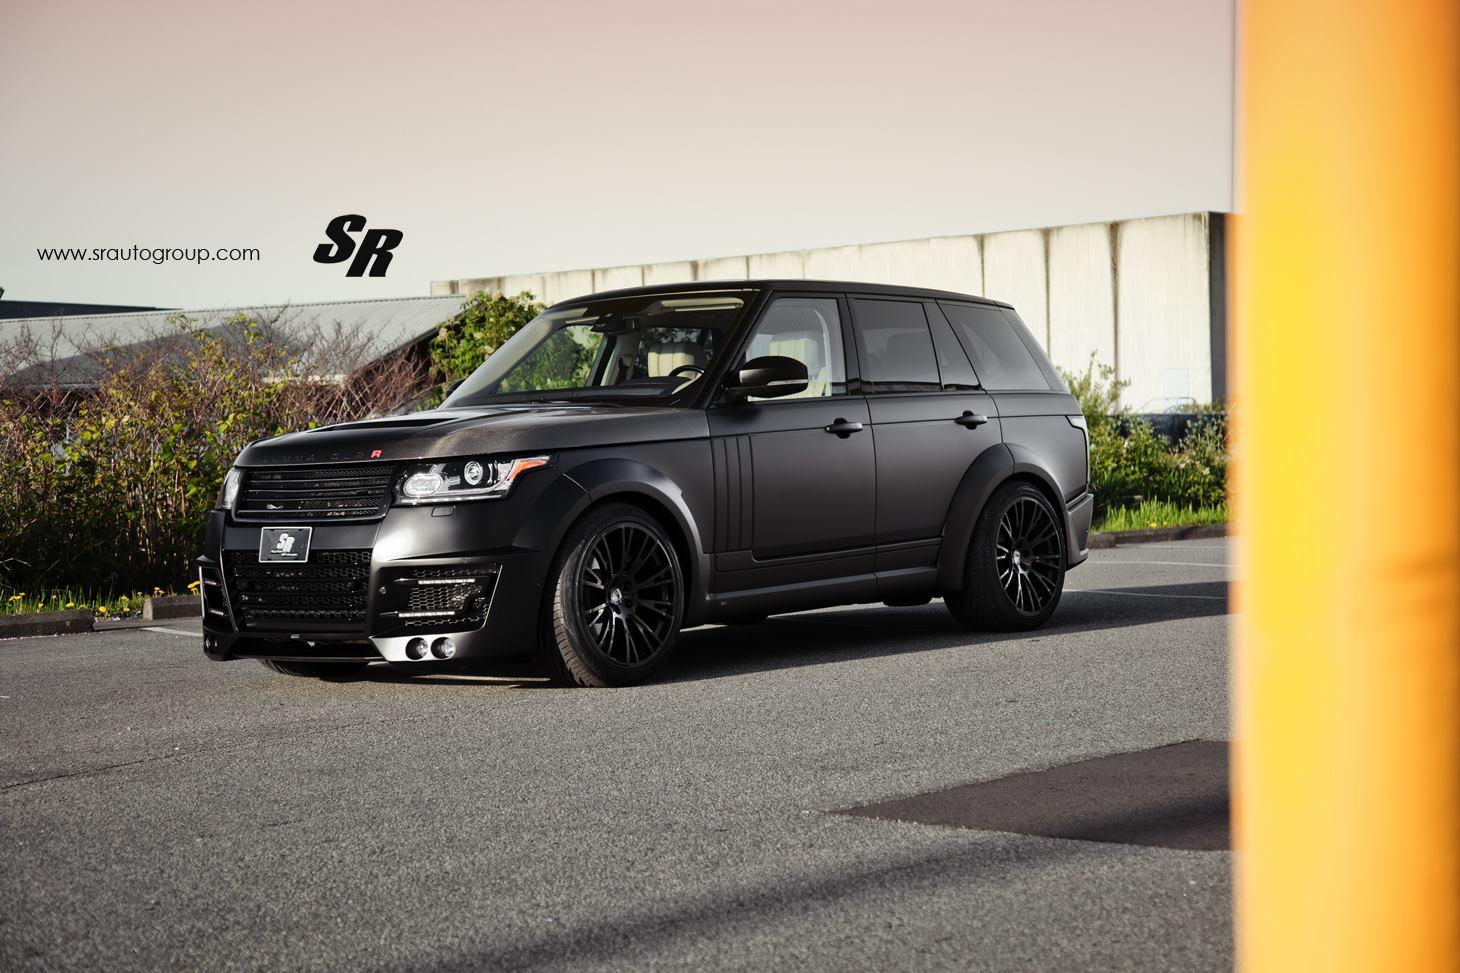 2014 sr auto group range rover sport clr r lumma design dark cars wallpapers. Black Bedroom Furniture Sets. Home Design Ideas